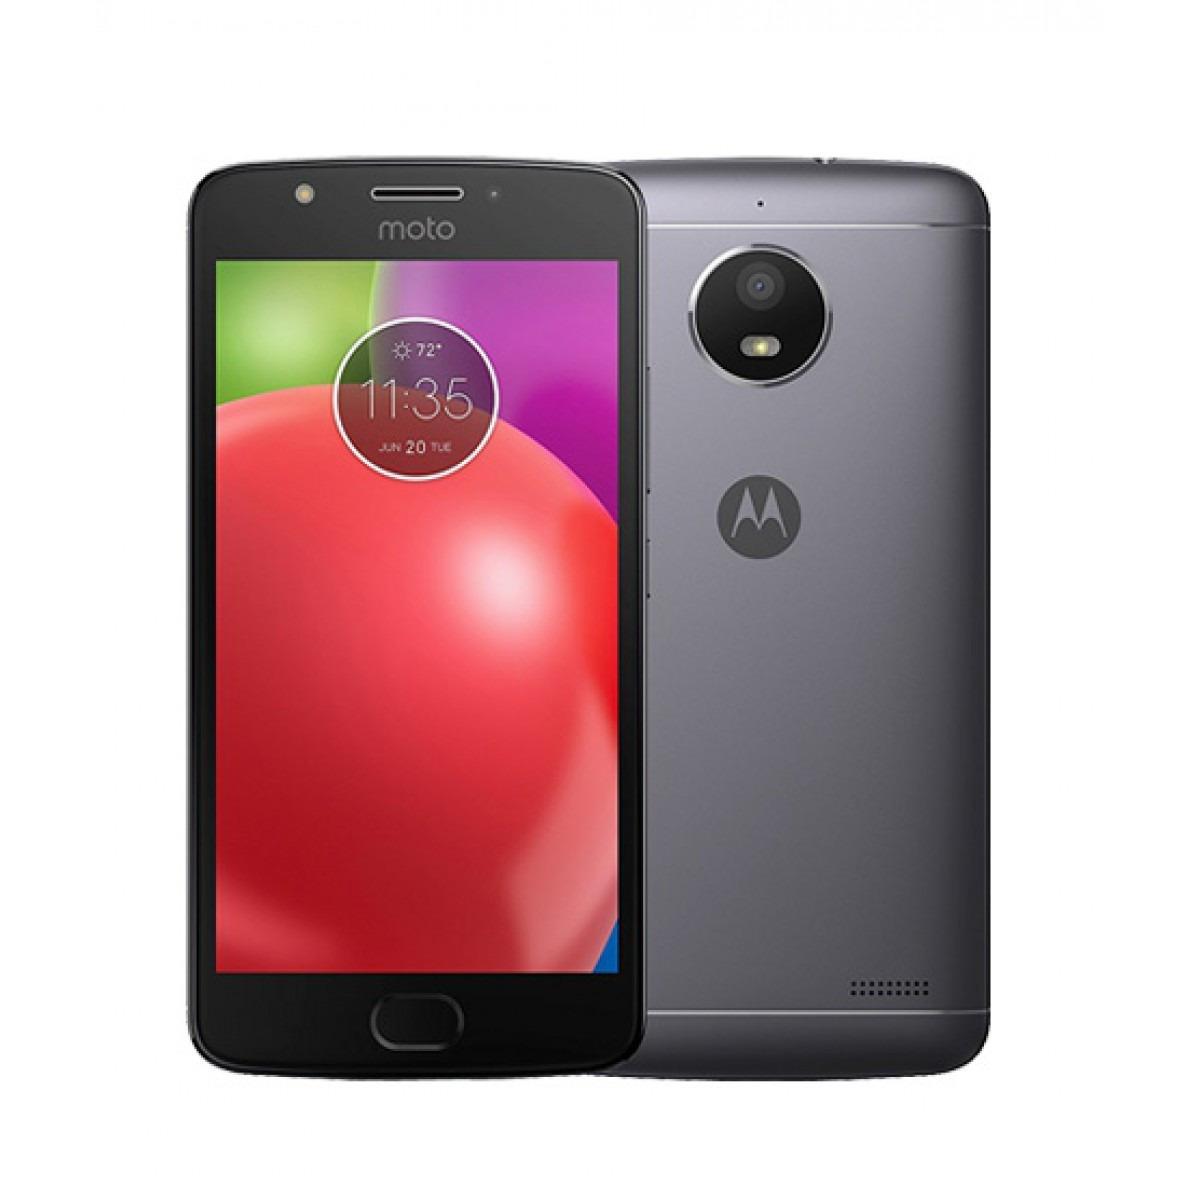 Motorola Moto E4 - 2/16 GB - Dual SIM - 4G LTE - Grey